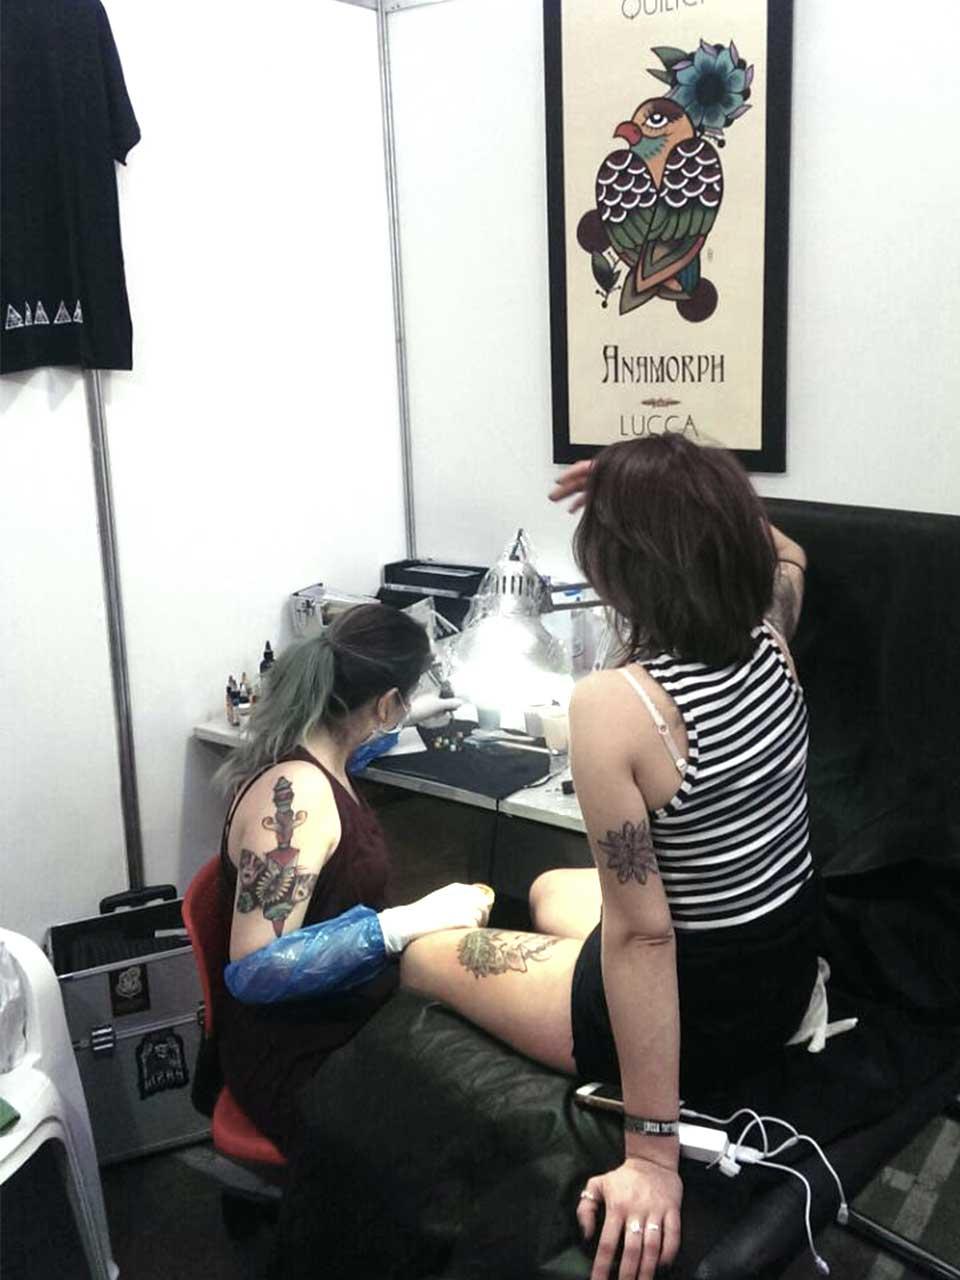 lucca tatuaggi